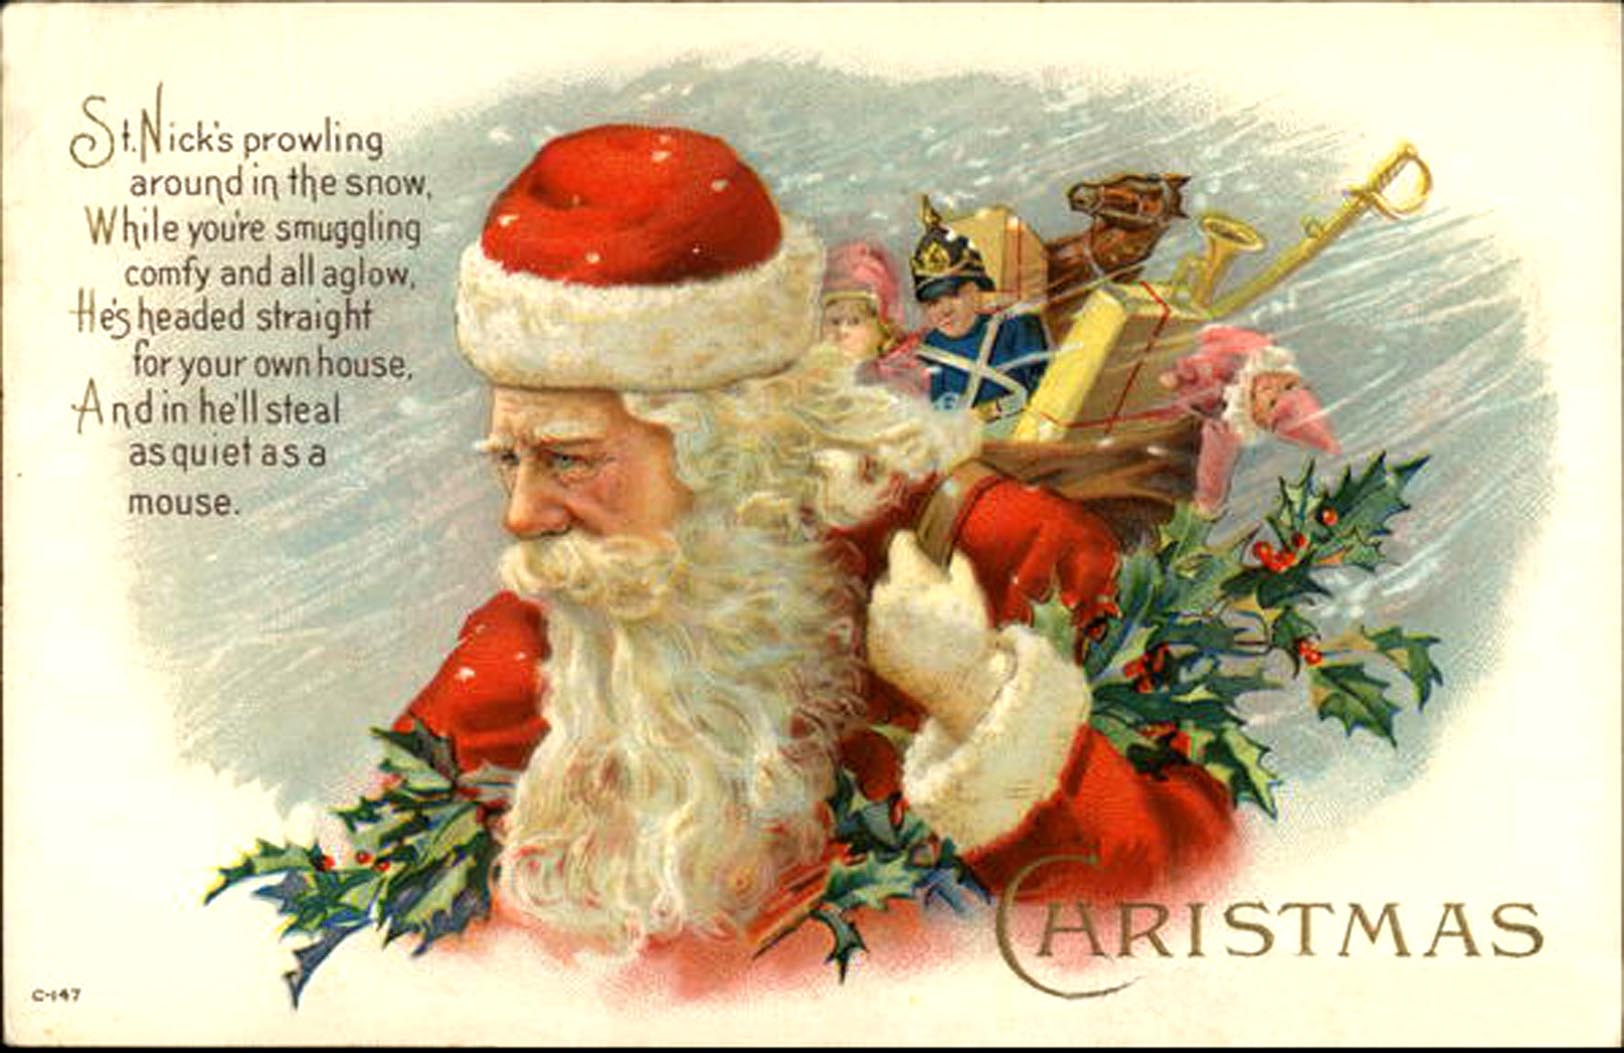 Santa, filling stockings on Christmas Eve night